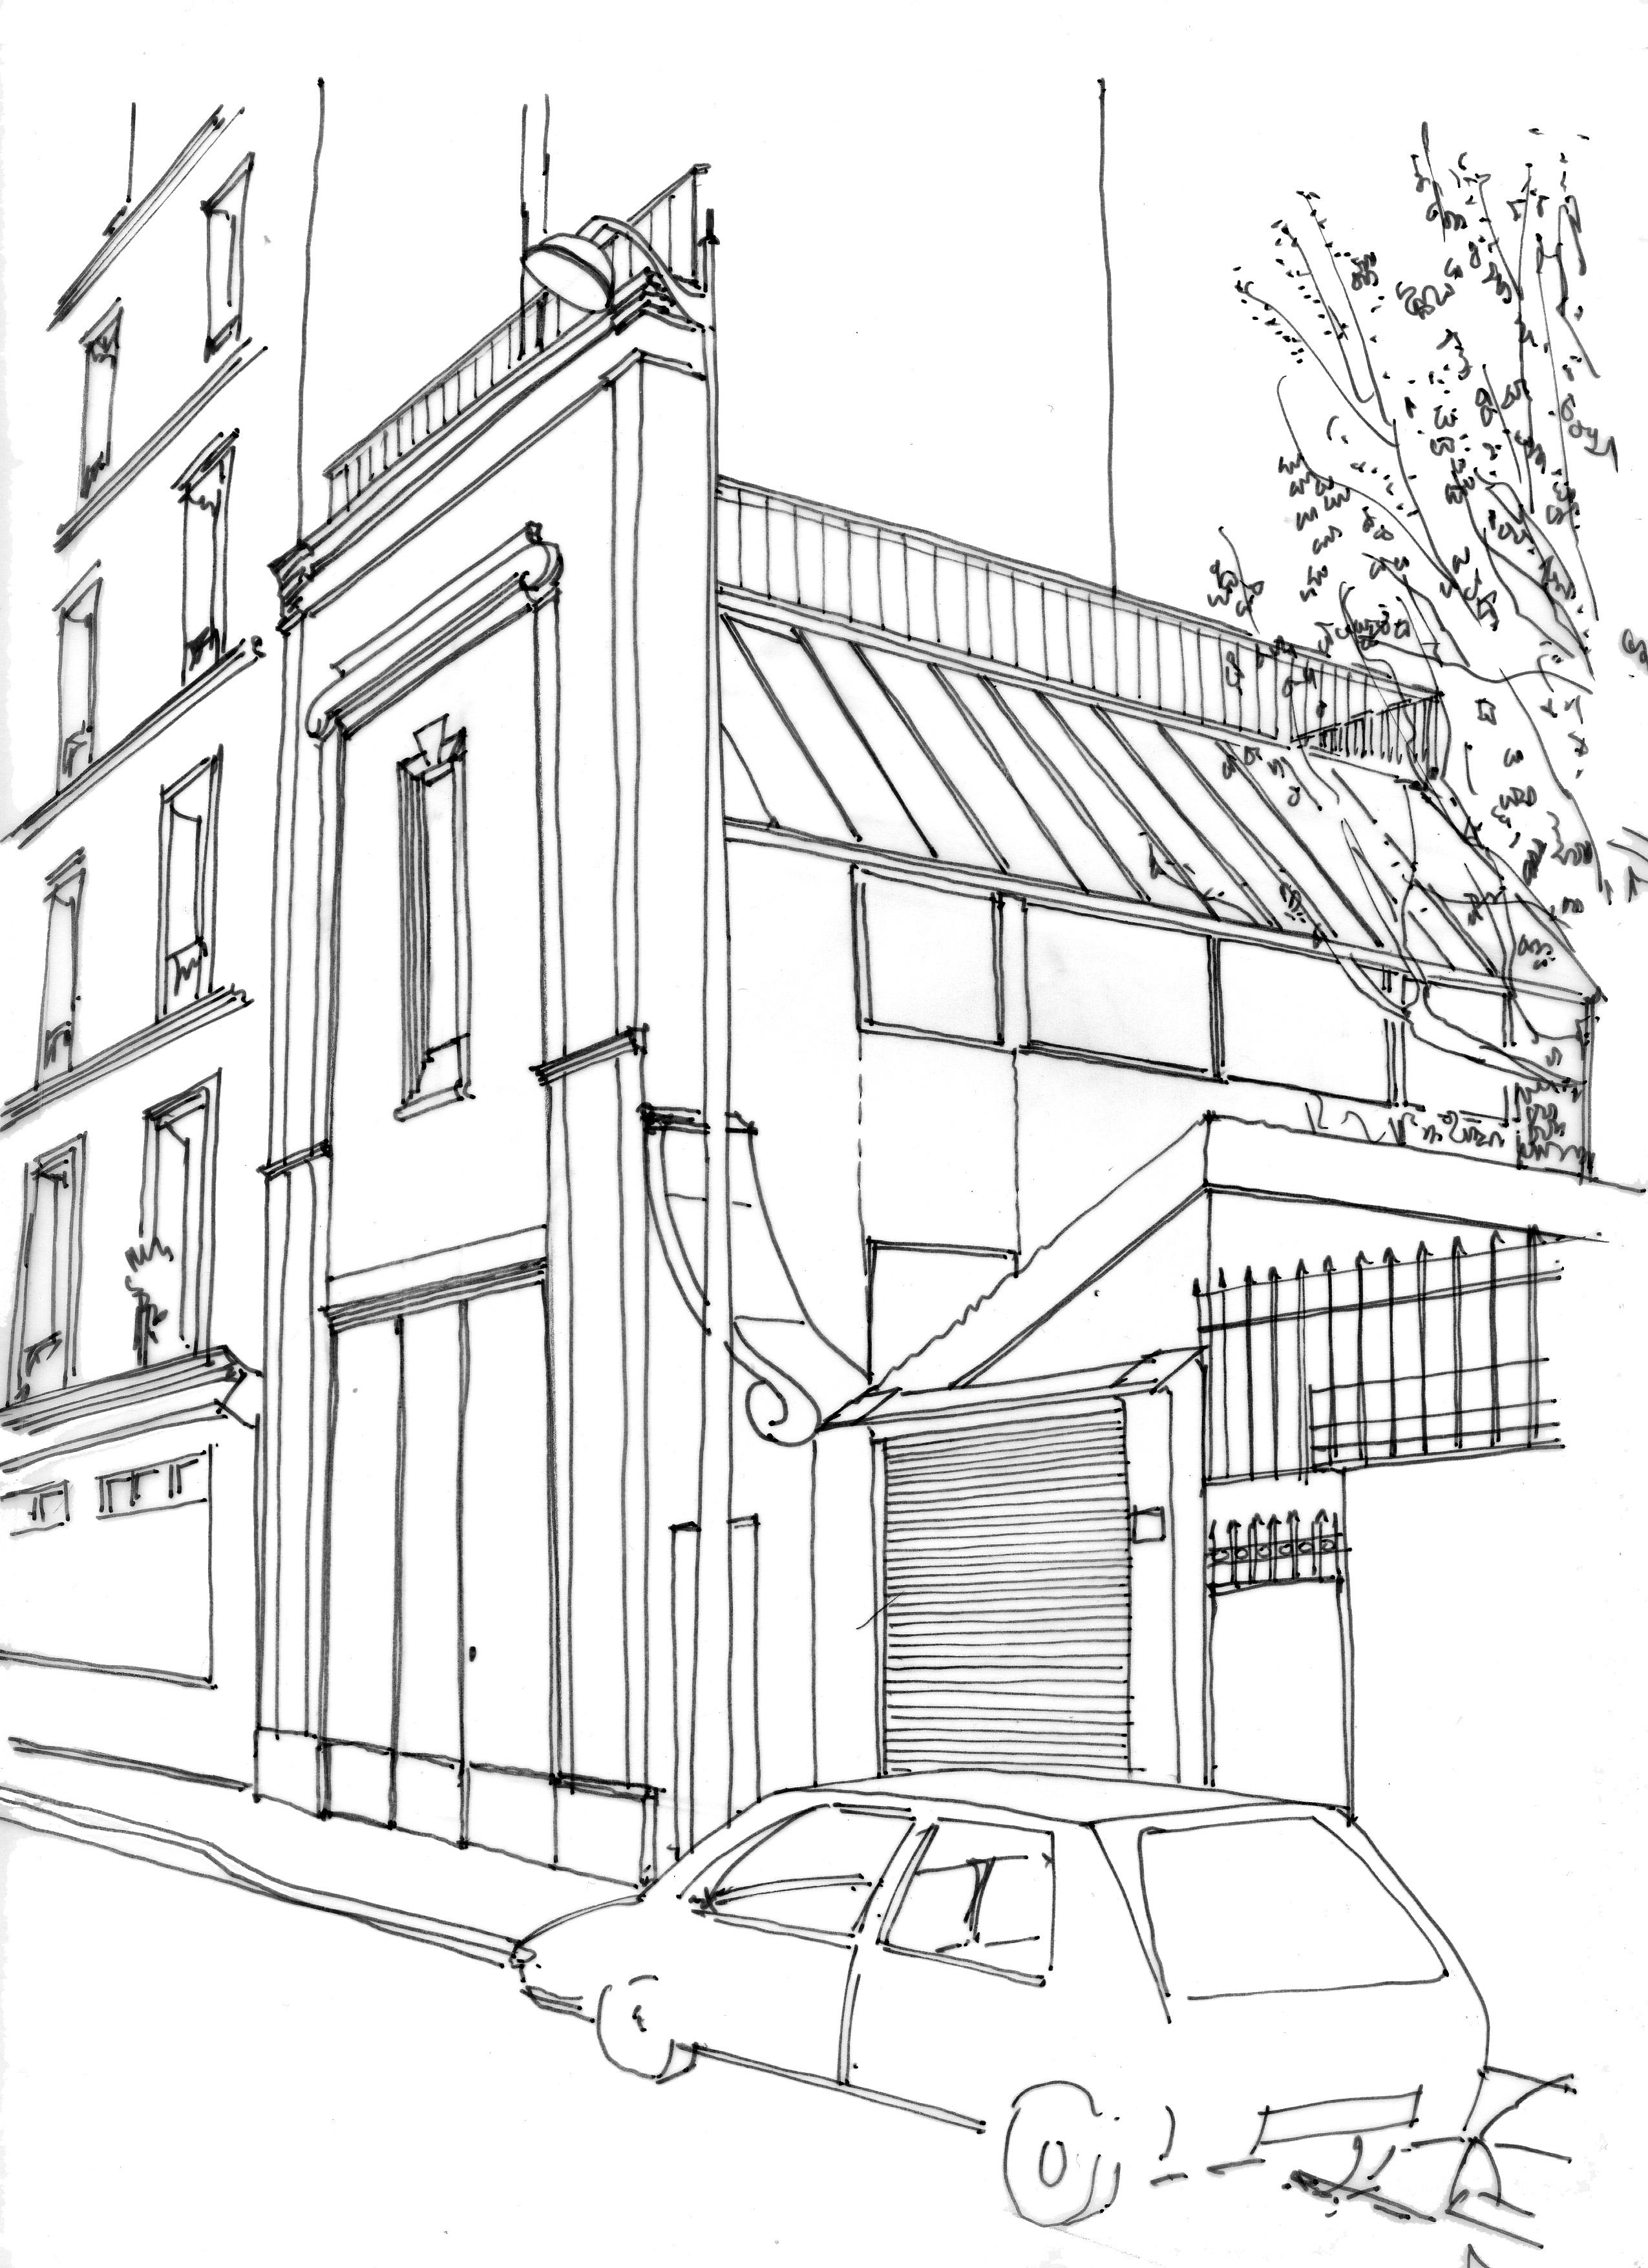 Atelier d'artiste rue Ledion 75014